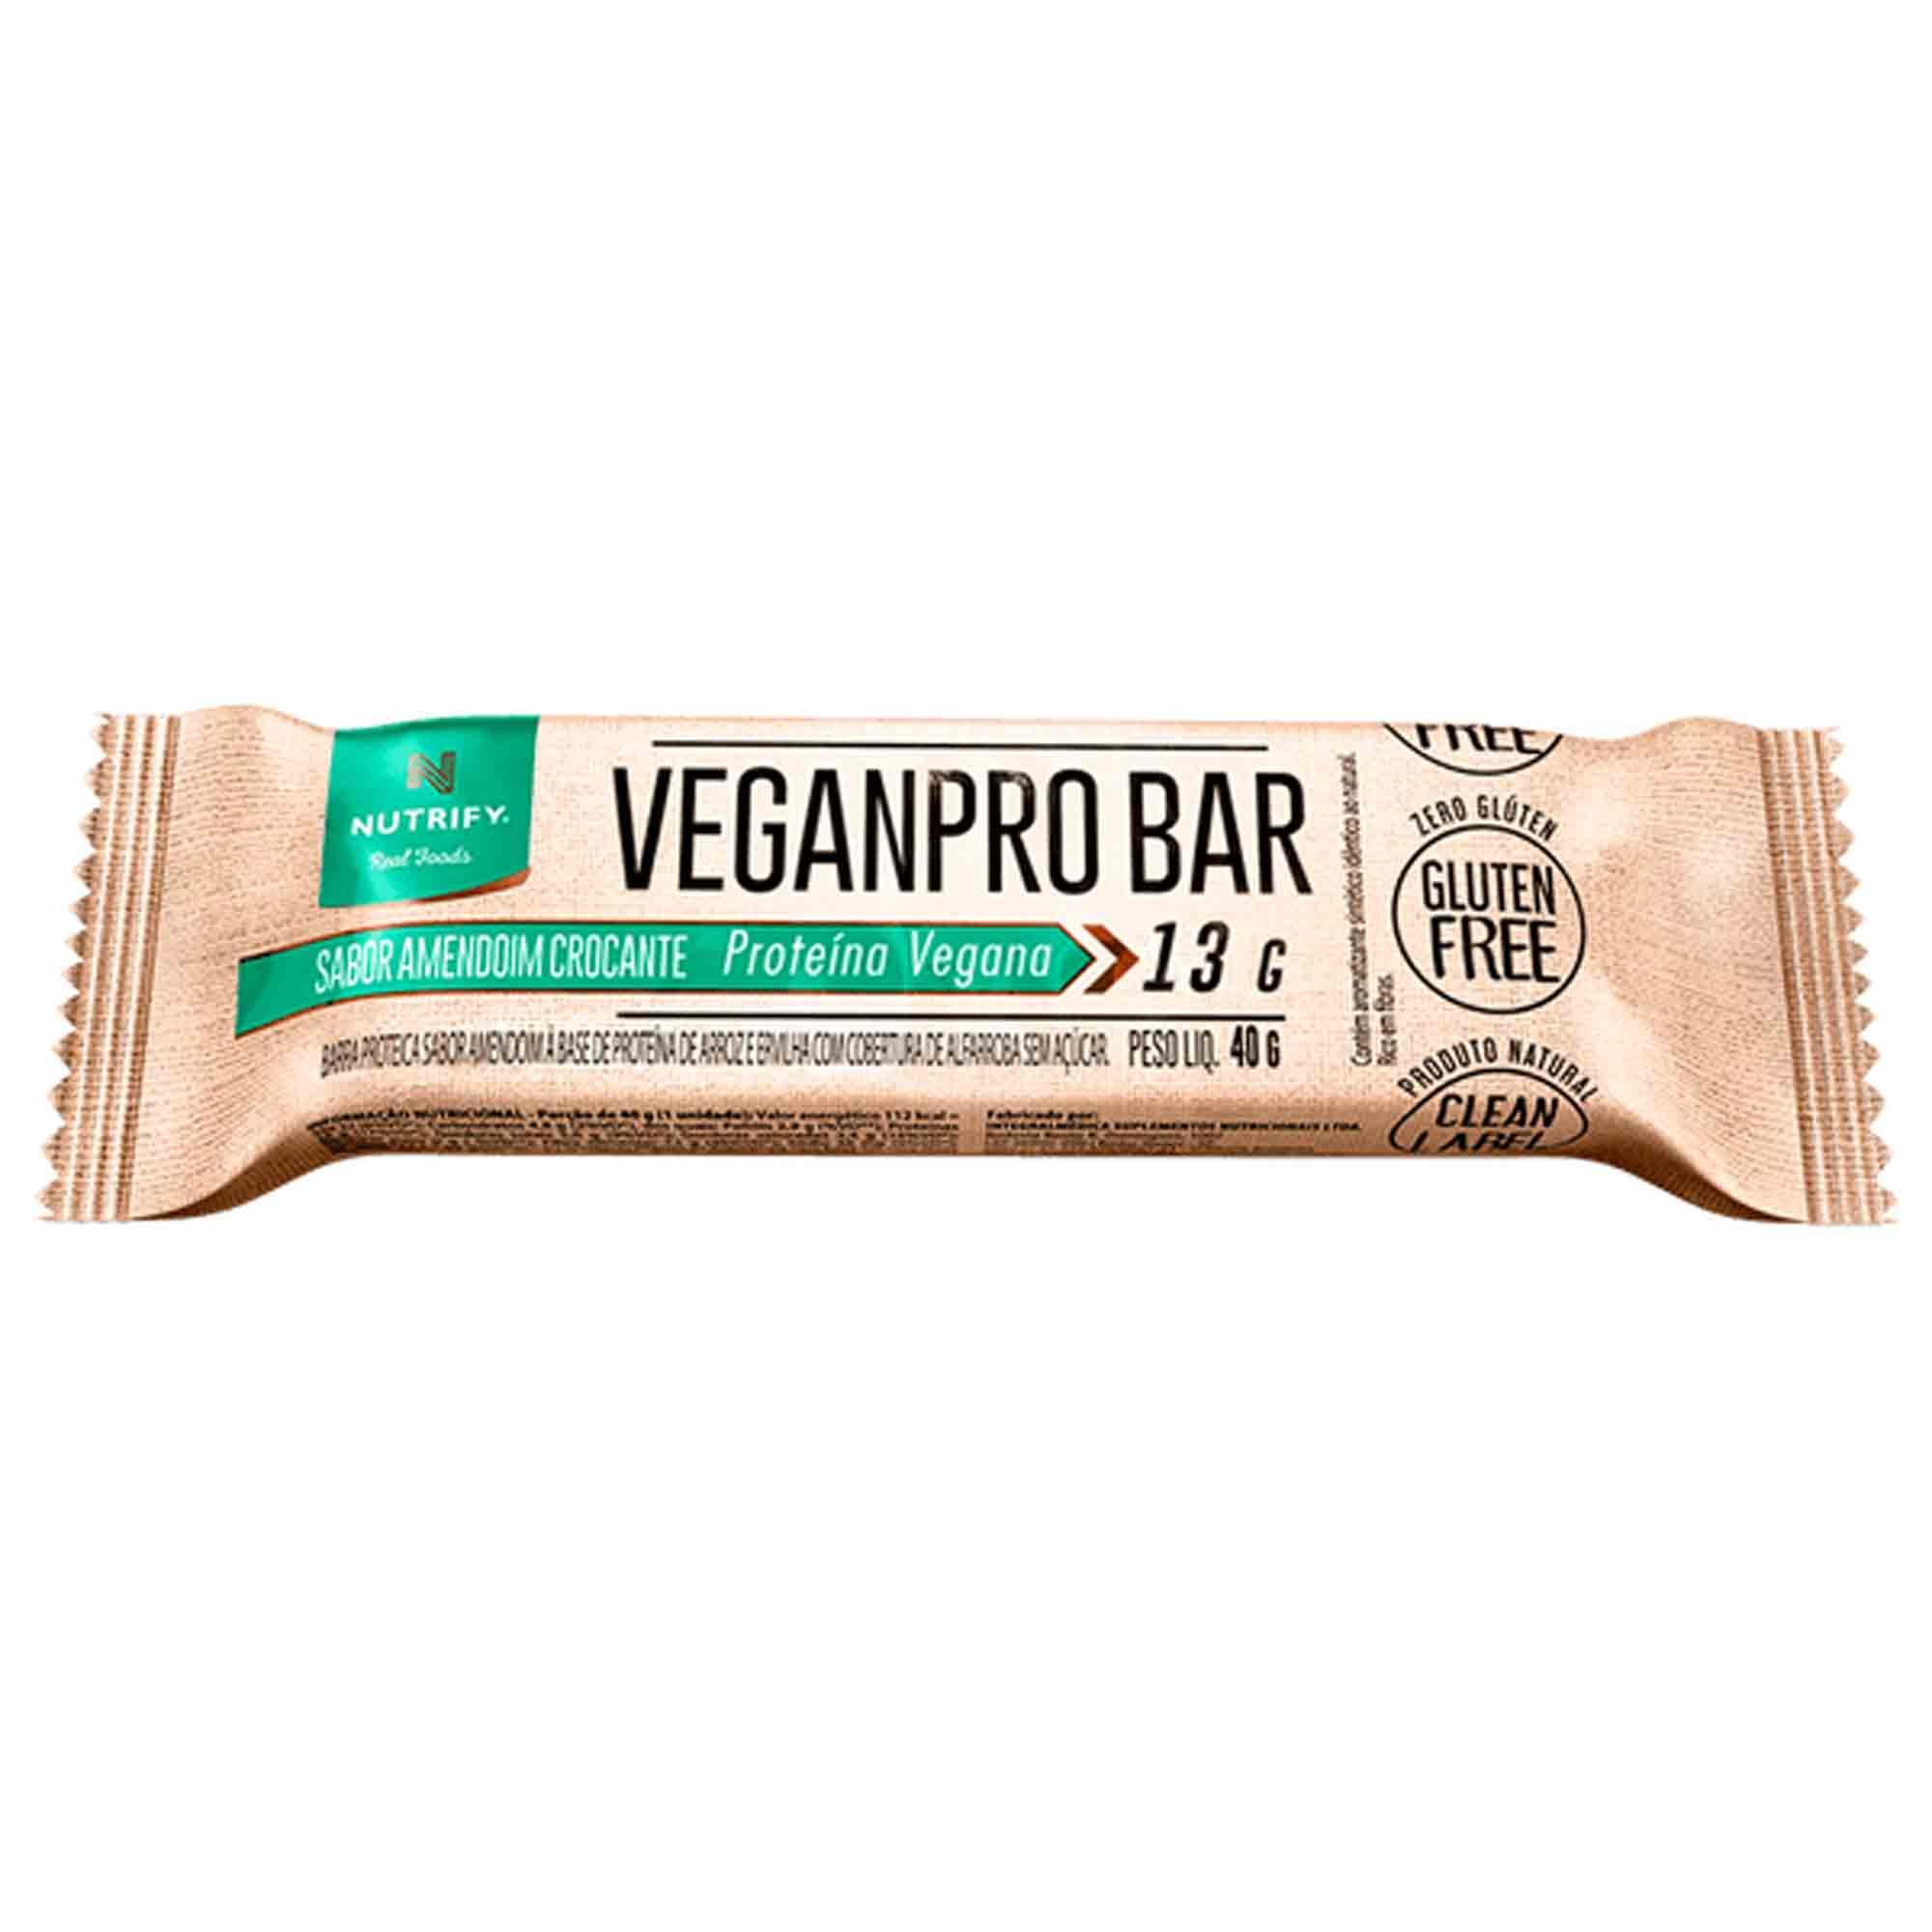 Veganpro Bar sabor Amemdoim Crocante 13g Nutrify